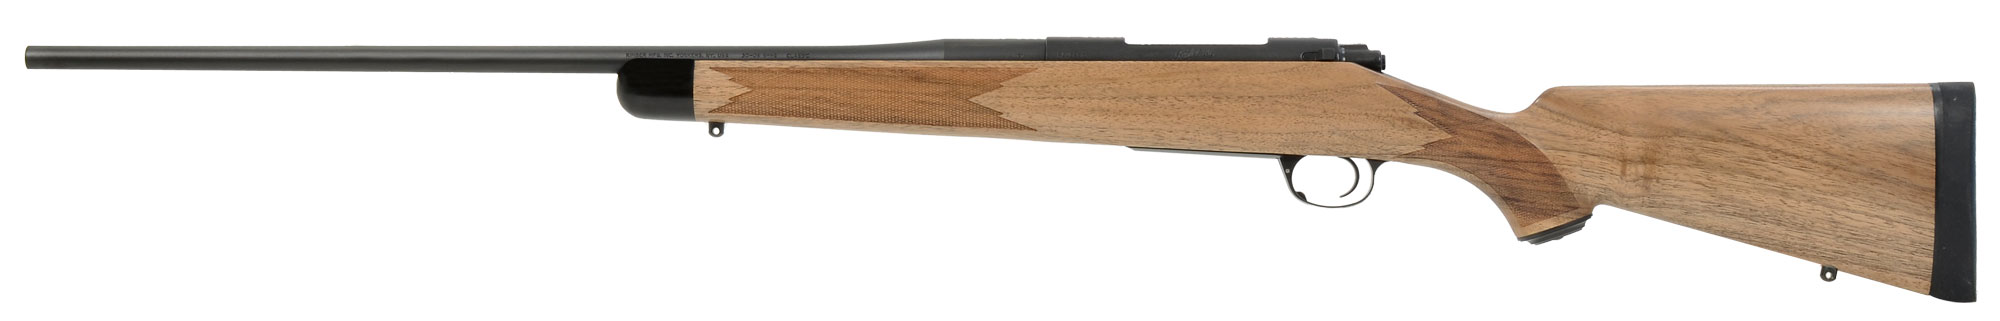 Kimber Classic Select Grade .30-06 Spfd. Rifle 3000734